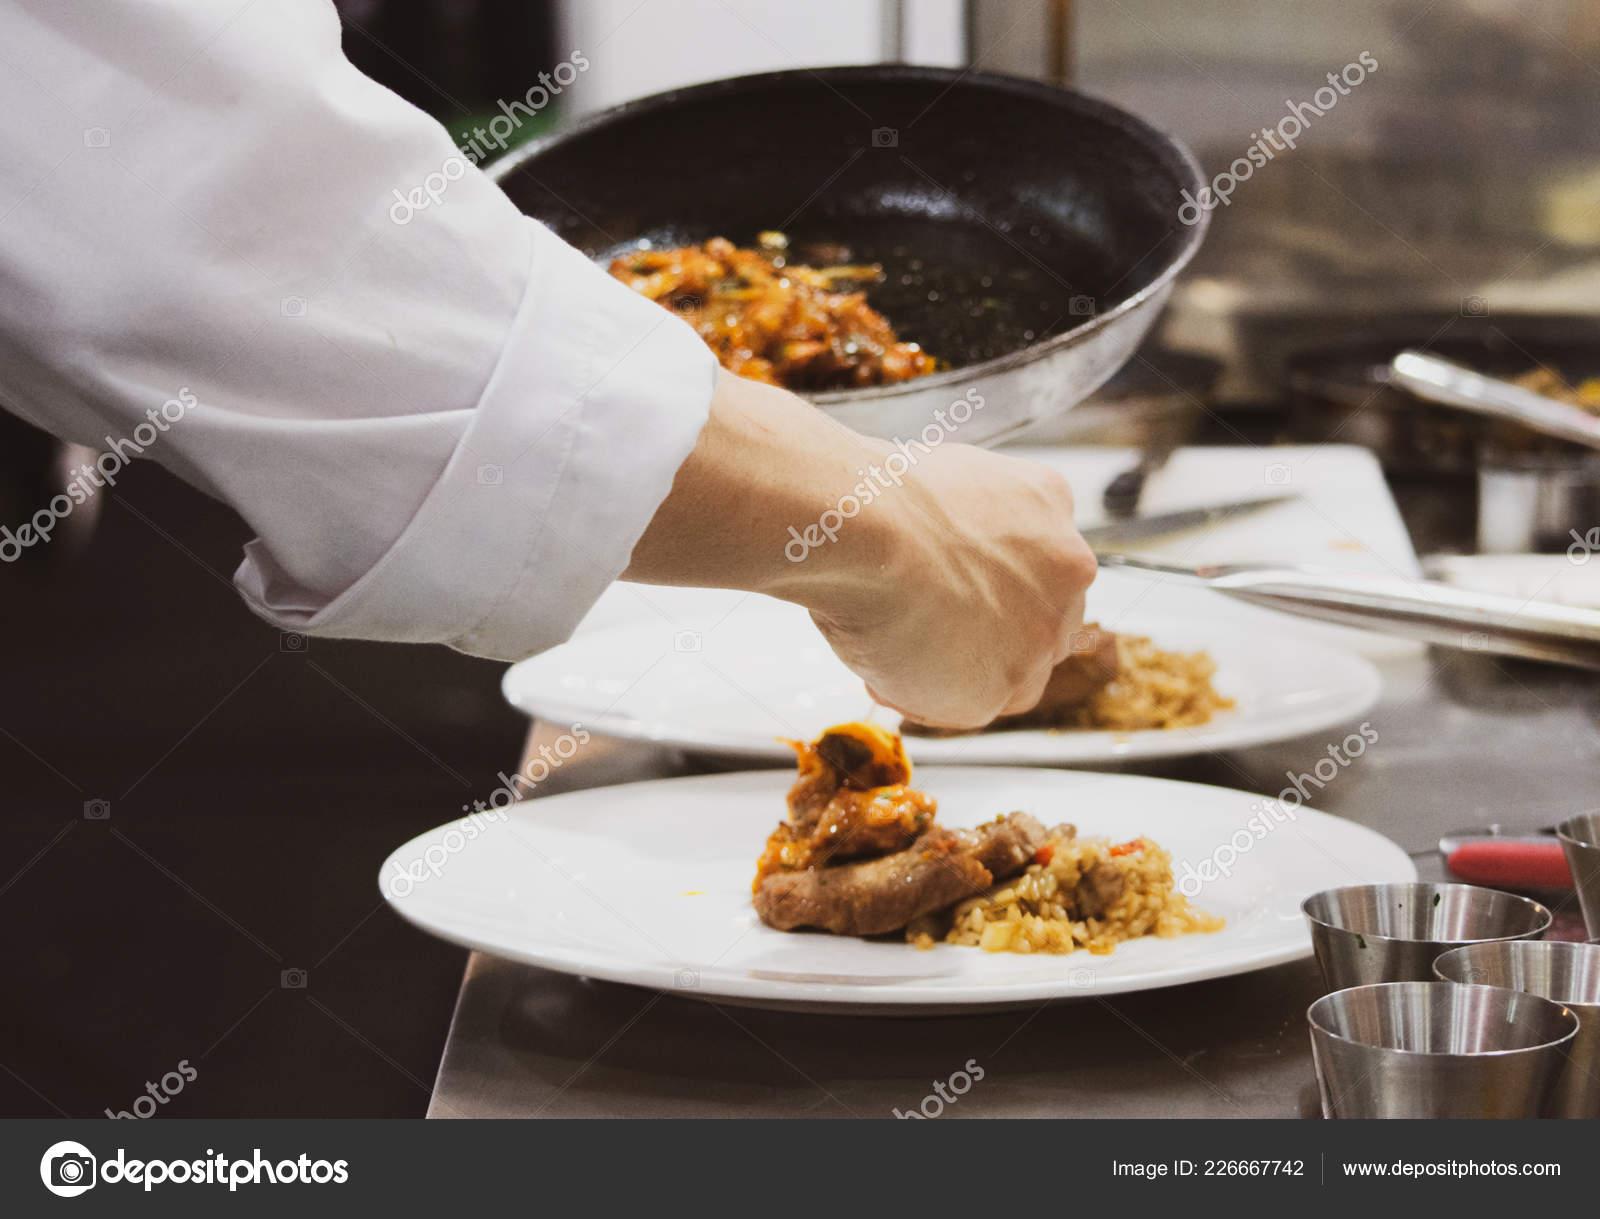 kitchen chef decor compost pots for 厨师准备食物在厨房厨师烹饪厨师装饰菜特写镜头 图库照片 c prarinya